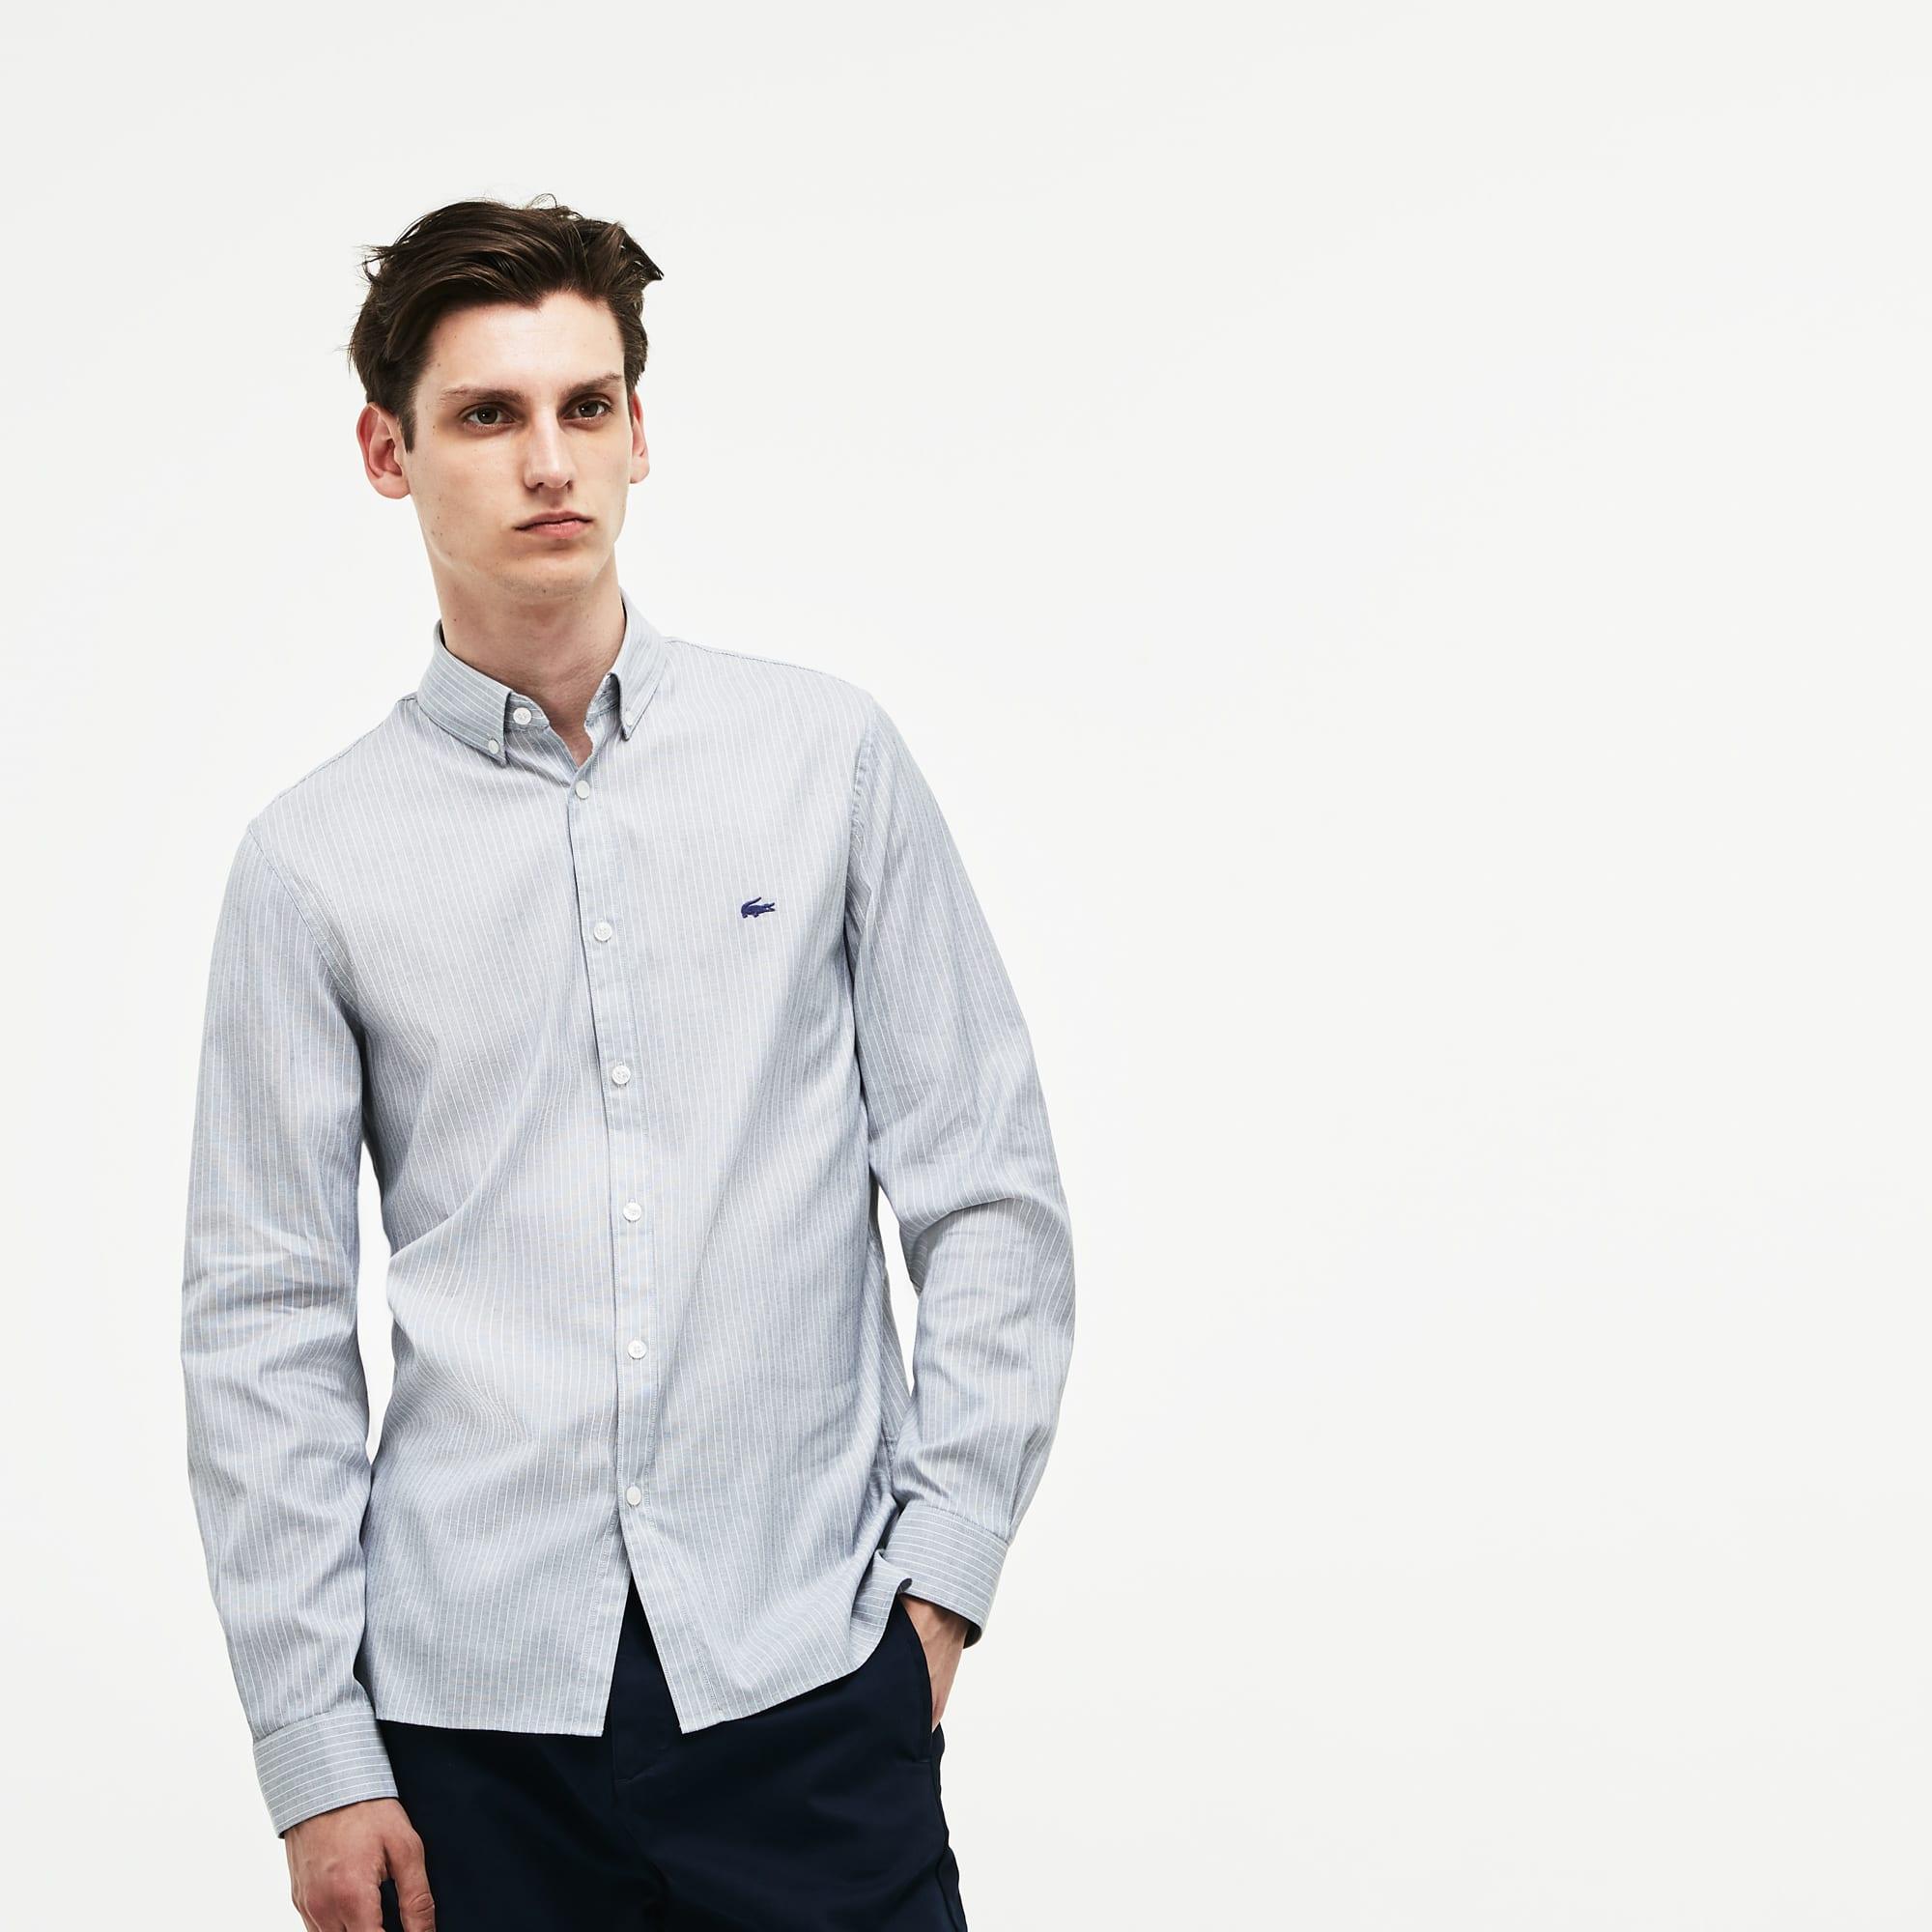 Men's Slim Fit Striped Stretch Cotton Pinpoint Shirt